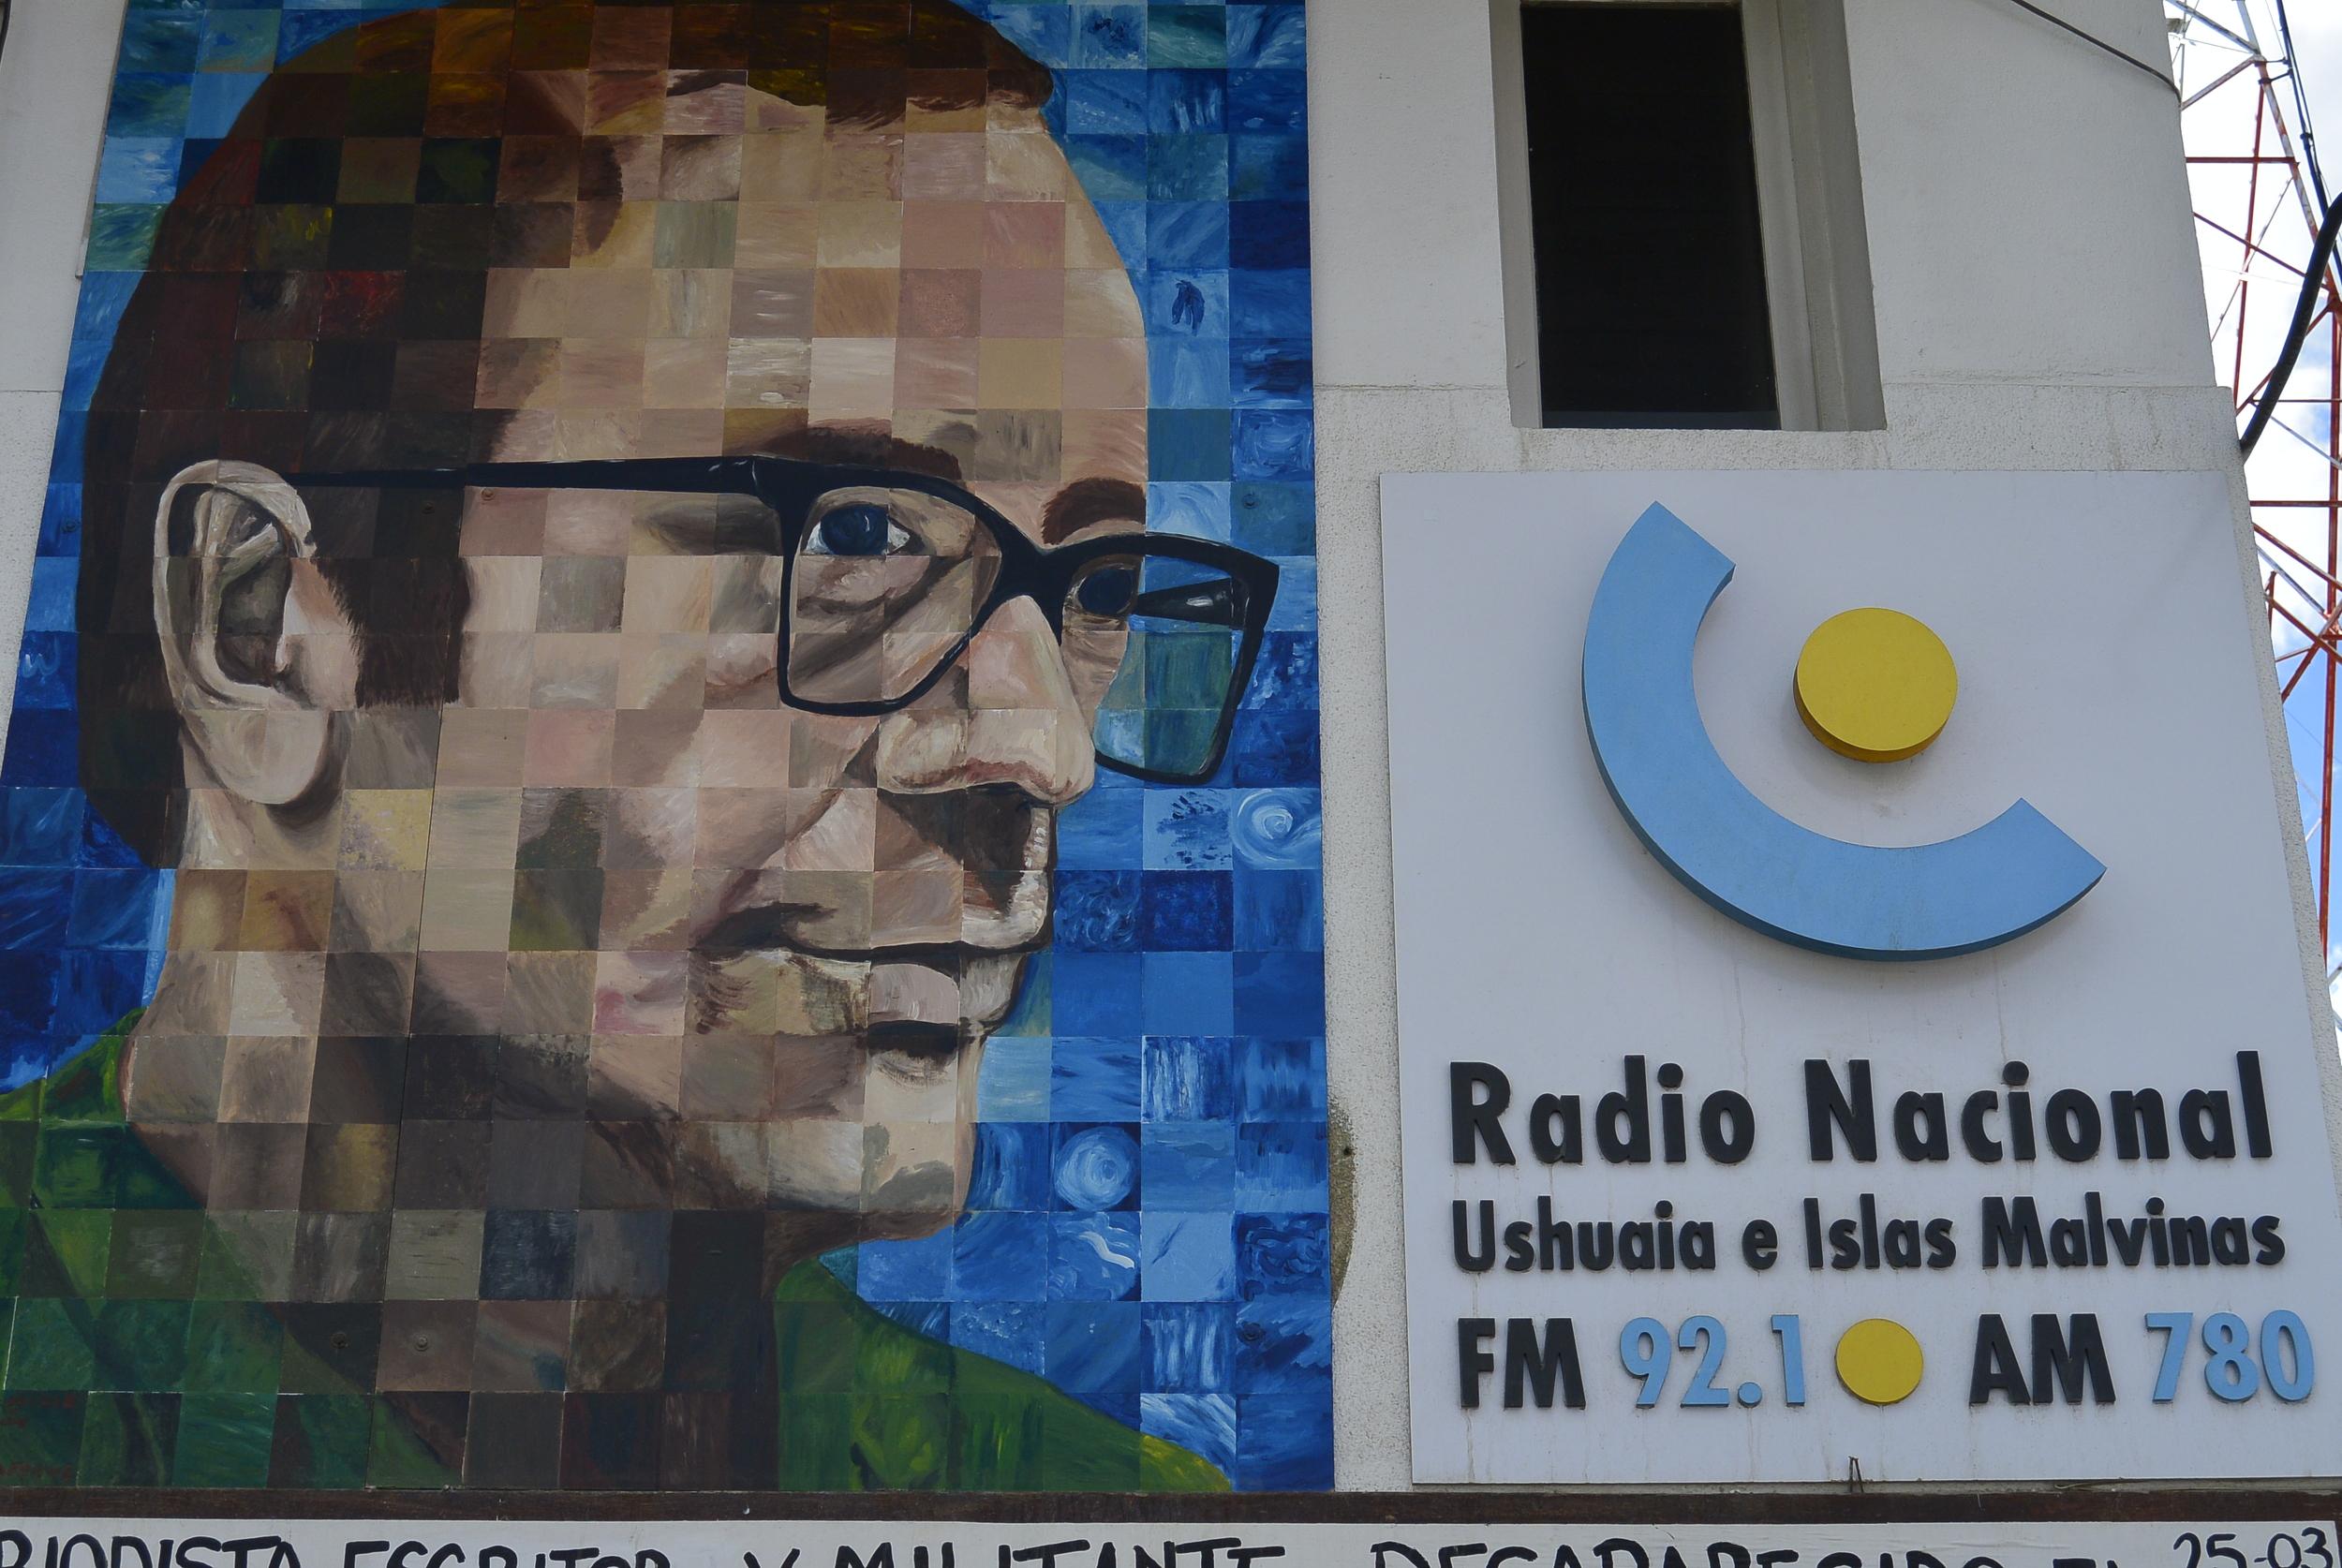 Ushuaia Argentina Radio Nacional